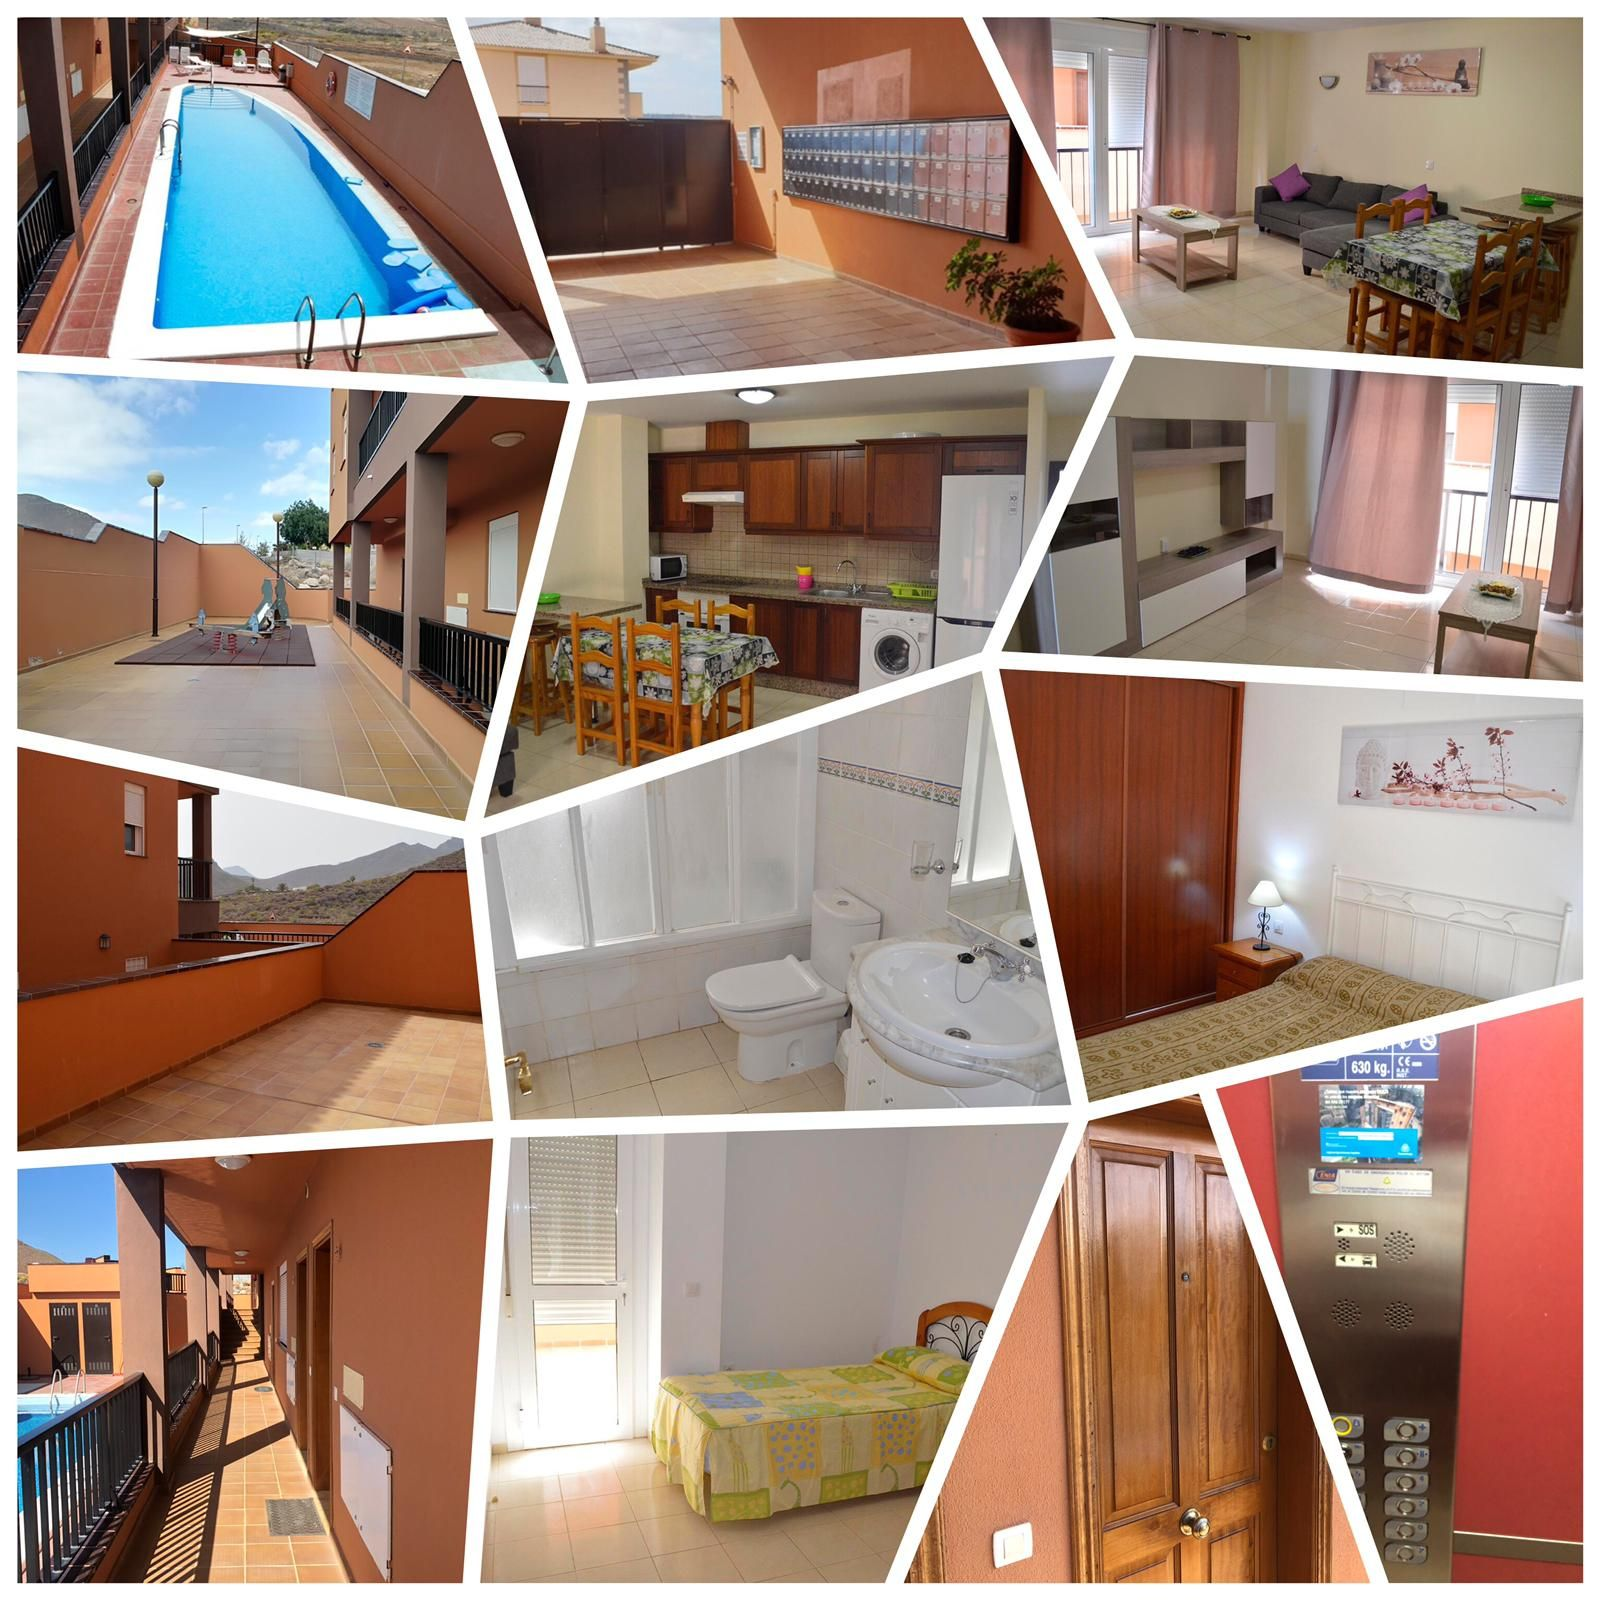 Apartment in San Miguel de Abona, LLANO DEL CAMELLO, for rent